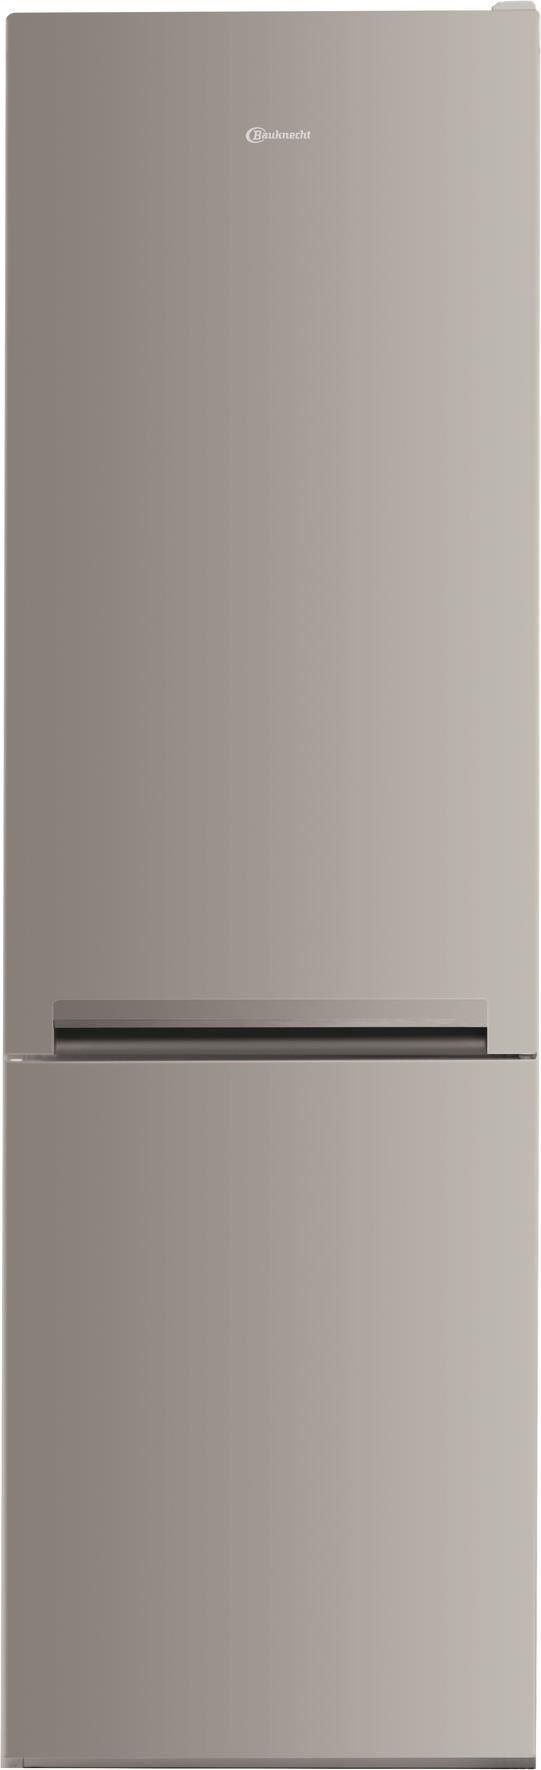 Хладилник BAUKNECHT KG 335, A ++